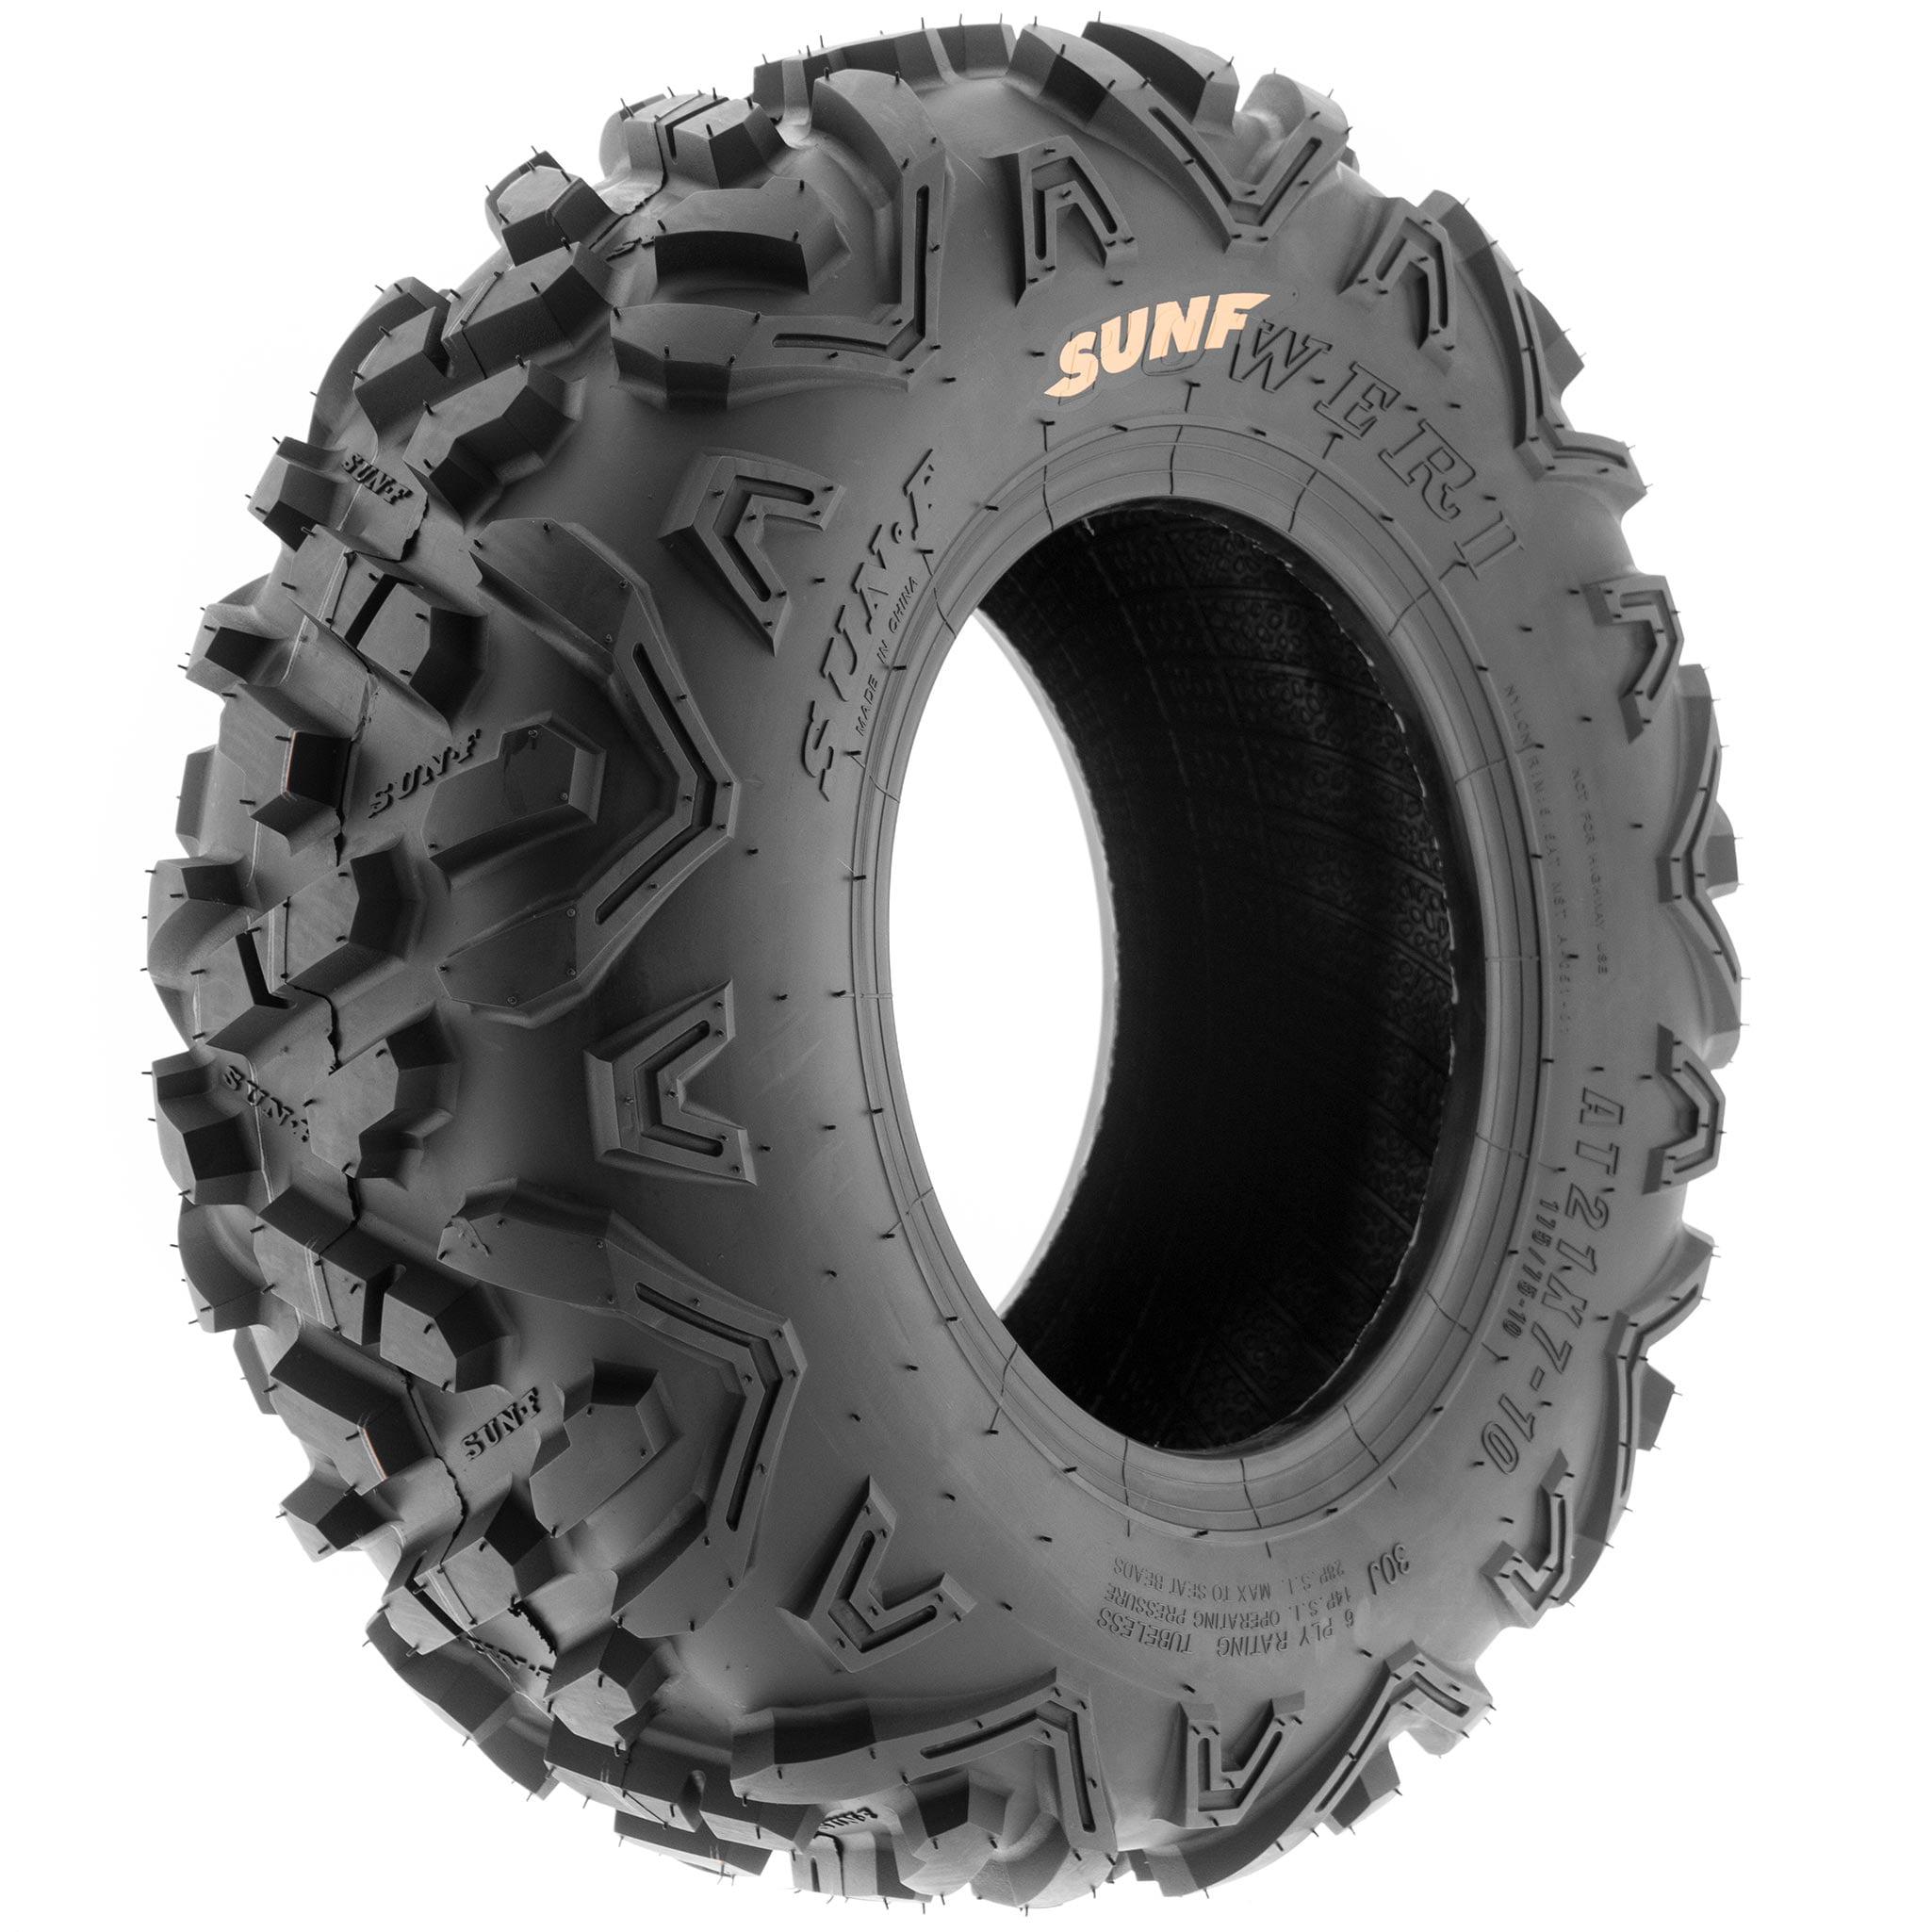 Pair of 2 SunF Power.II AT 16x8-7 ATV /& Go-Kart Off-Road Tires All-Terrain 6 PR Tubeless A051